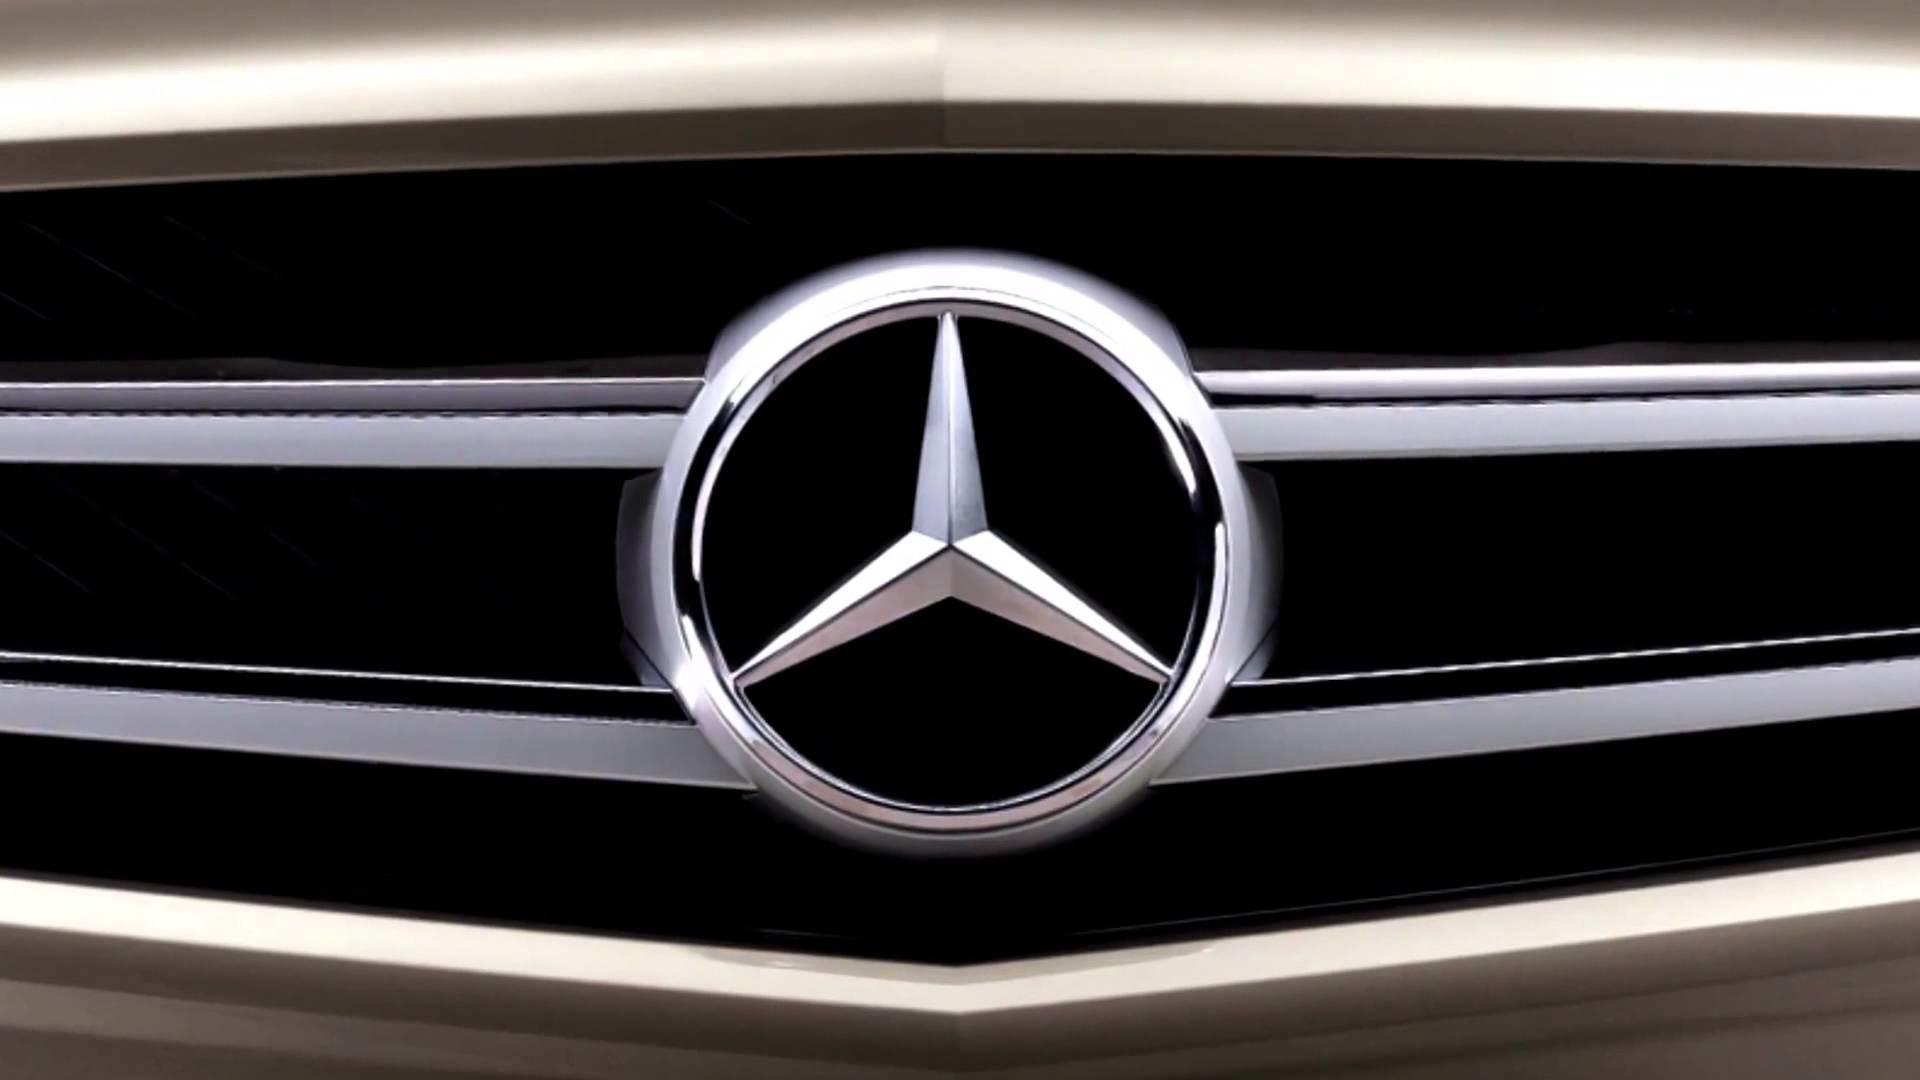 Mercedes Benz Logo Wallpapers 53 Images